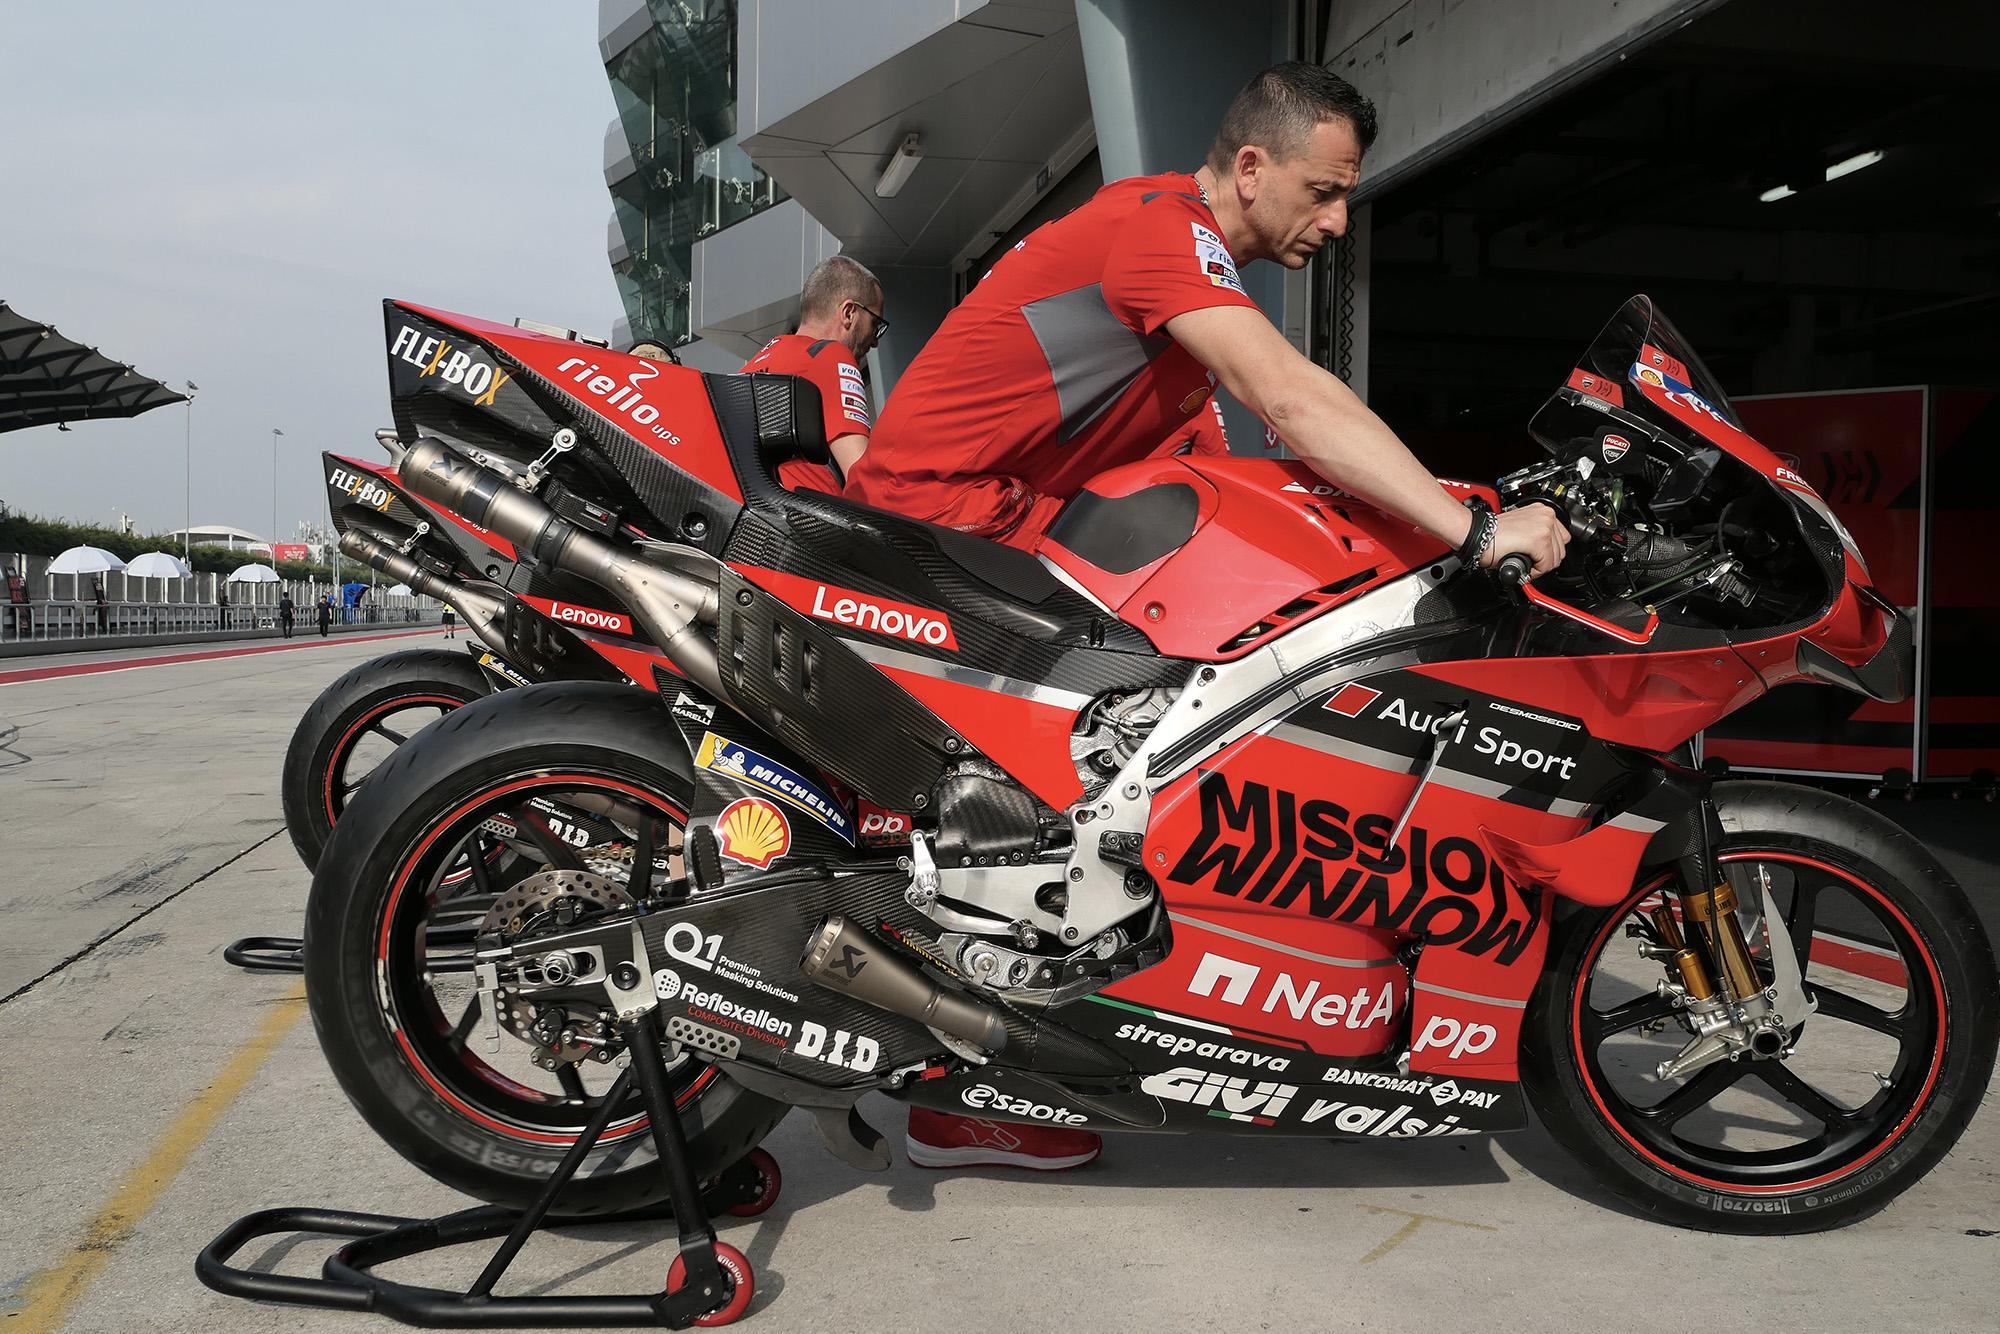 Side view of Andrea Dovizioso's Ducati in 2020 MotoGP Sepang testing